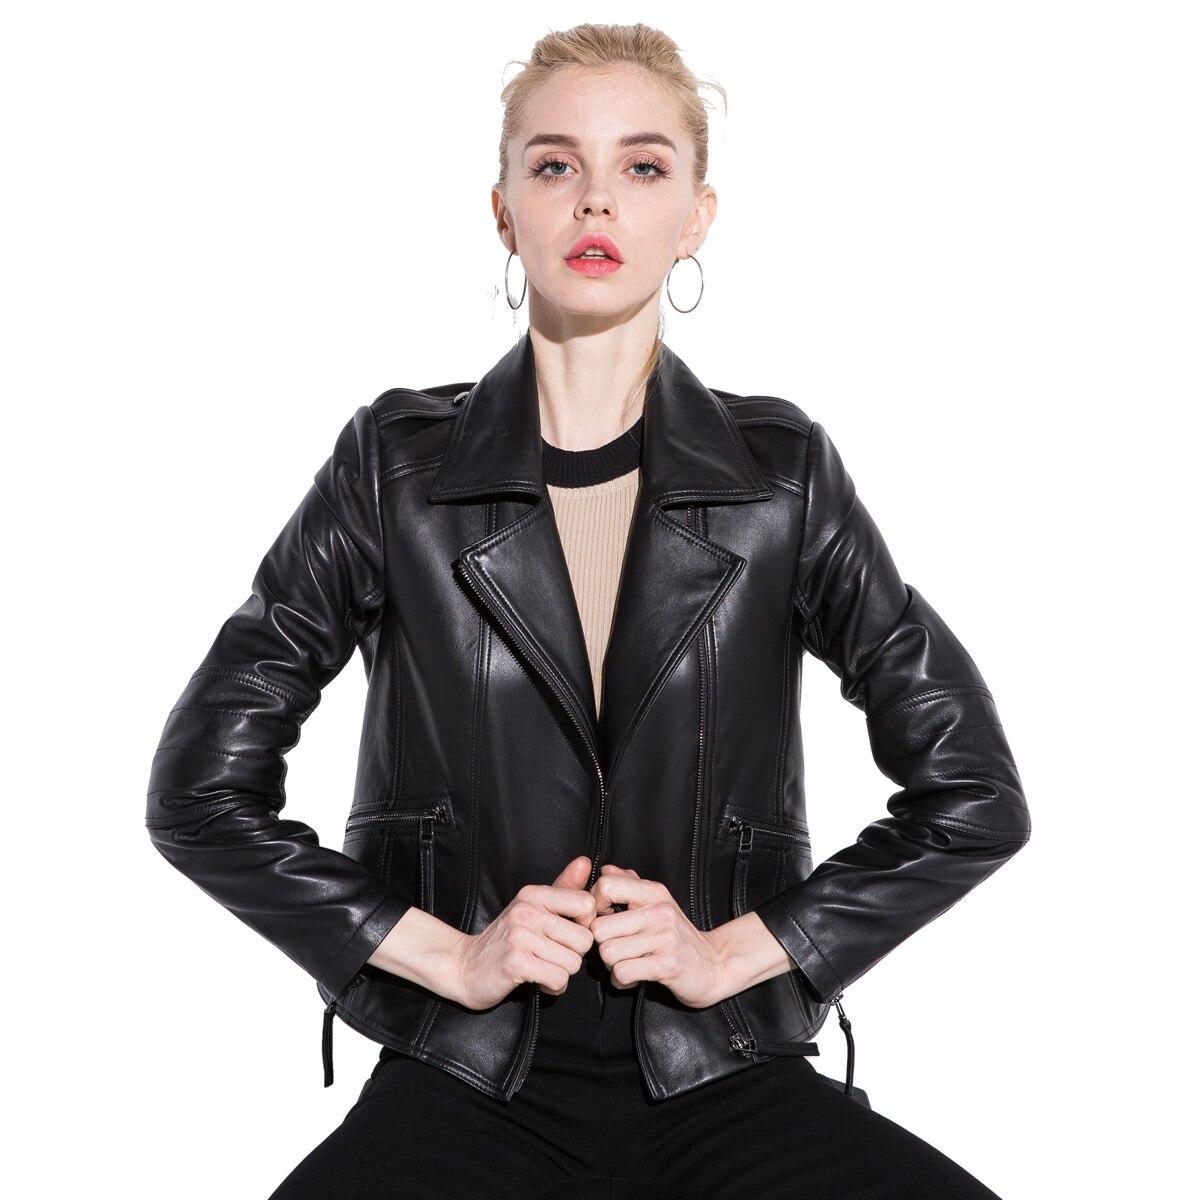 Real Genuine Leather Jacket Autumn Coat Women Clothes 2020 Korean Vintage Sheepskin Coat Female Black Tops Manteau 1851 YY1784